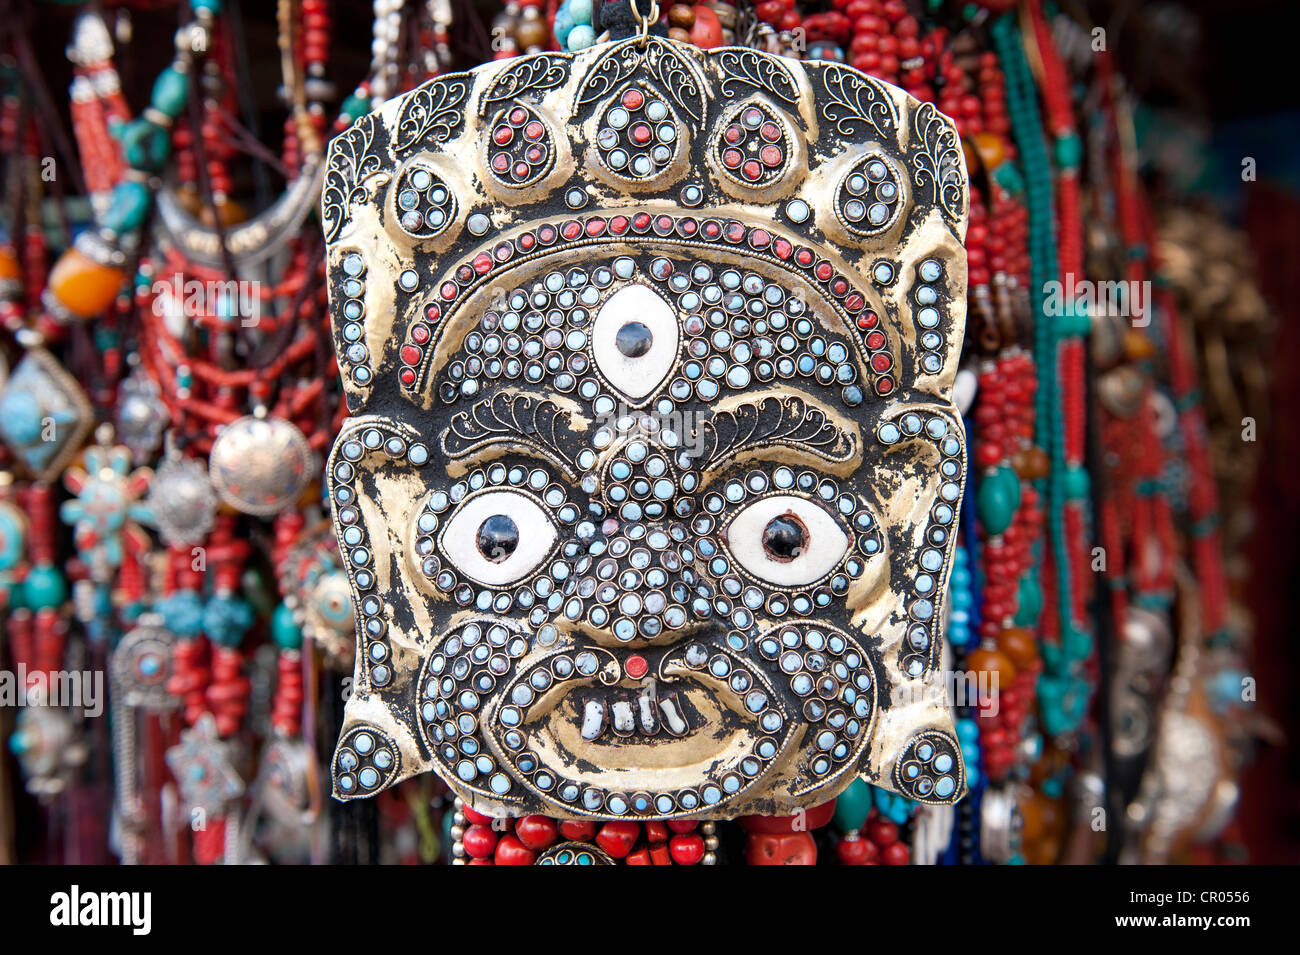 Tibetan mask, jewelry, necklaces, souvenirs, Lhasa, Himalaya Range, central Tibet, Ue-Tsang, Tibet Autonomous Region - Stock Image